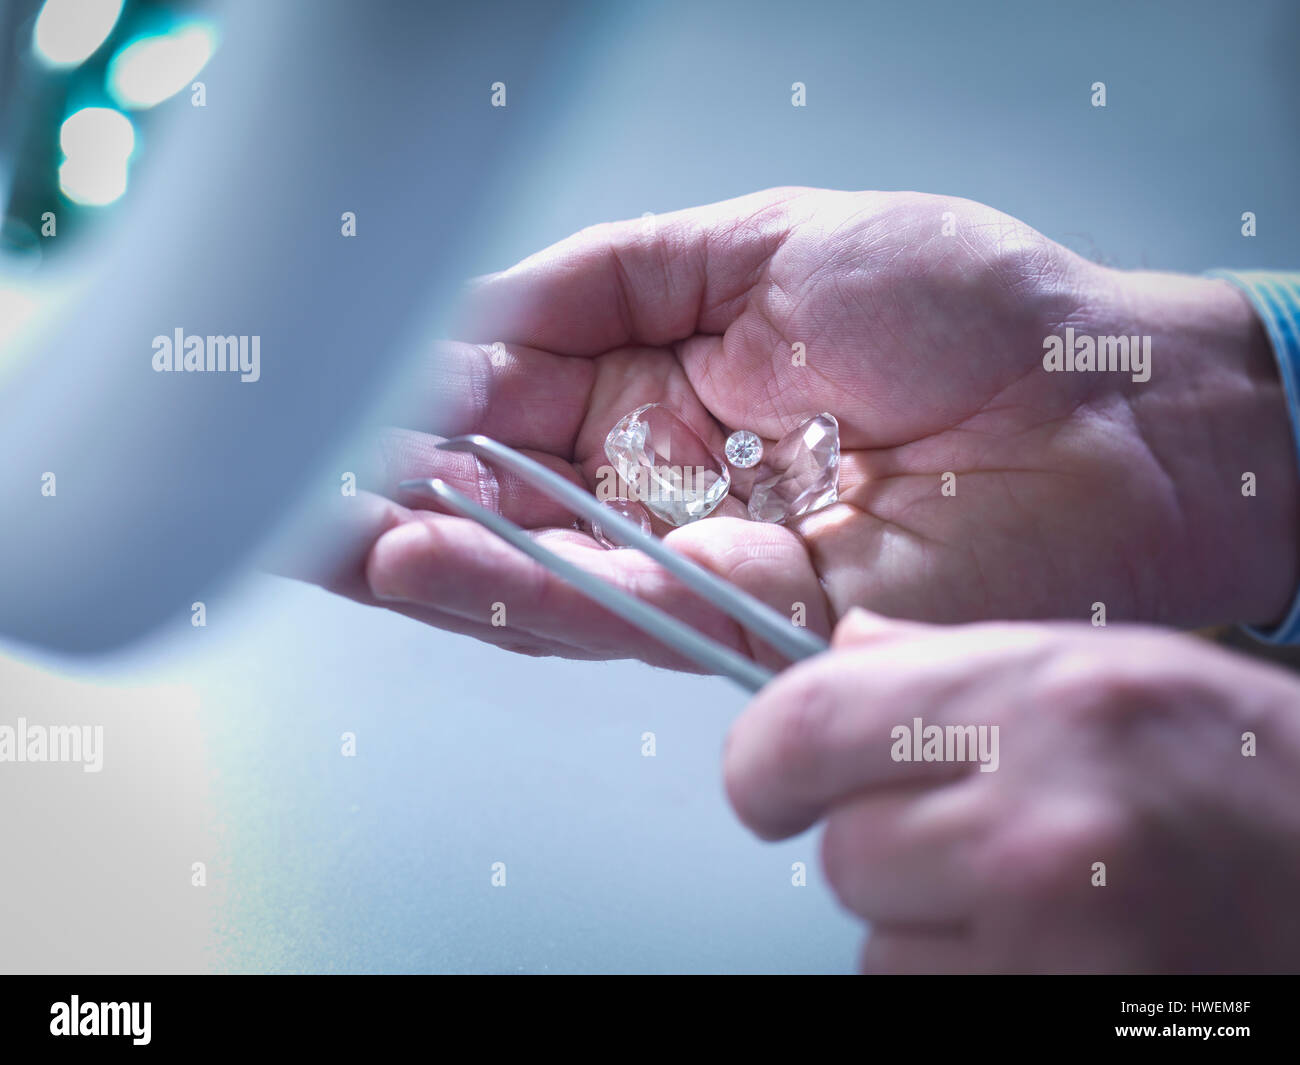 Jeweller inspecting replica diamonds in hand - Stock Image